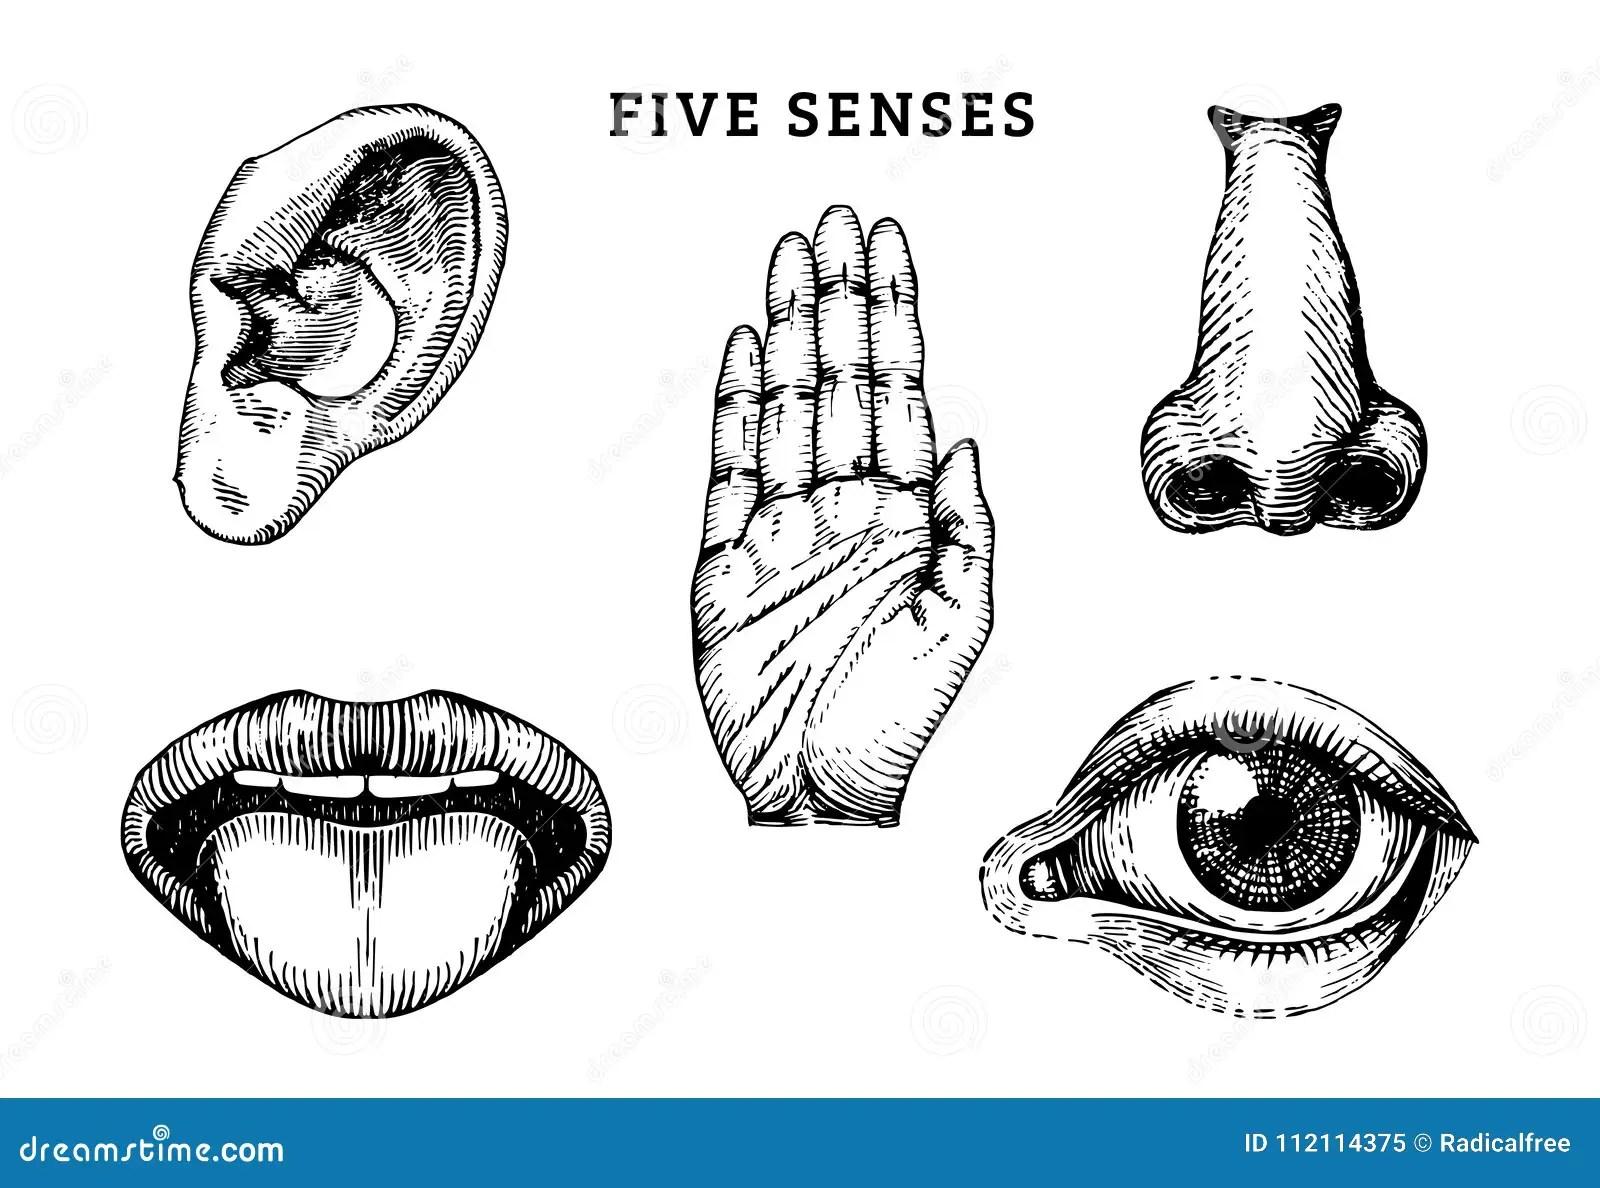 Human Sense Organs The Five Senses Of The Human Body